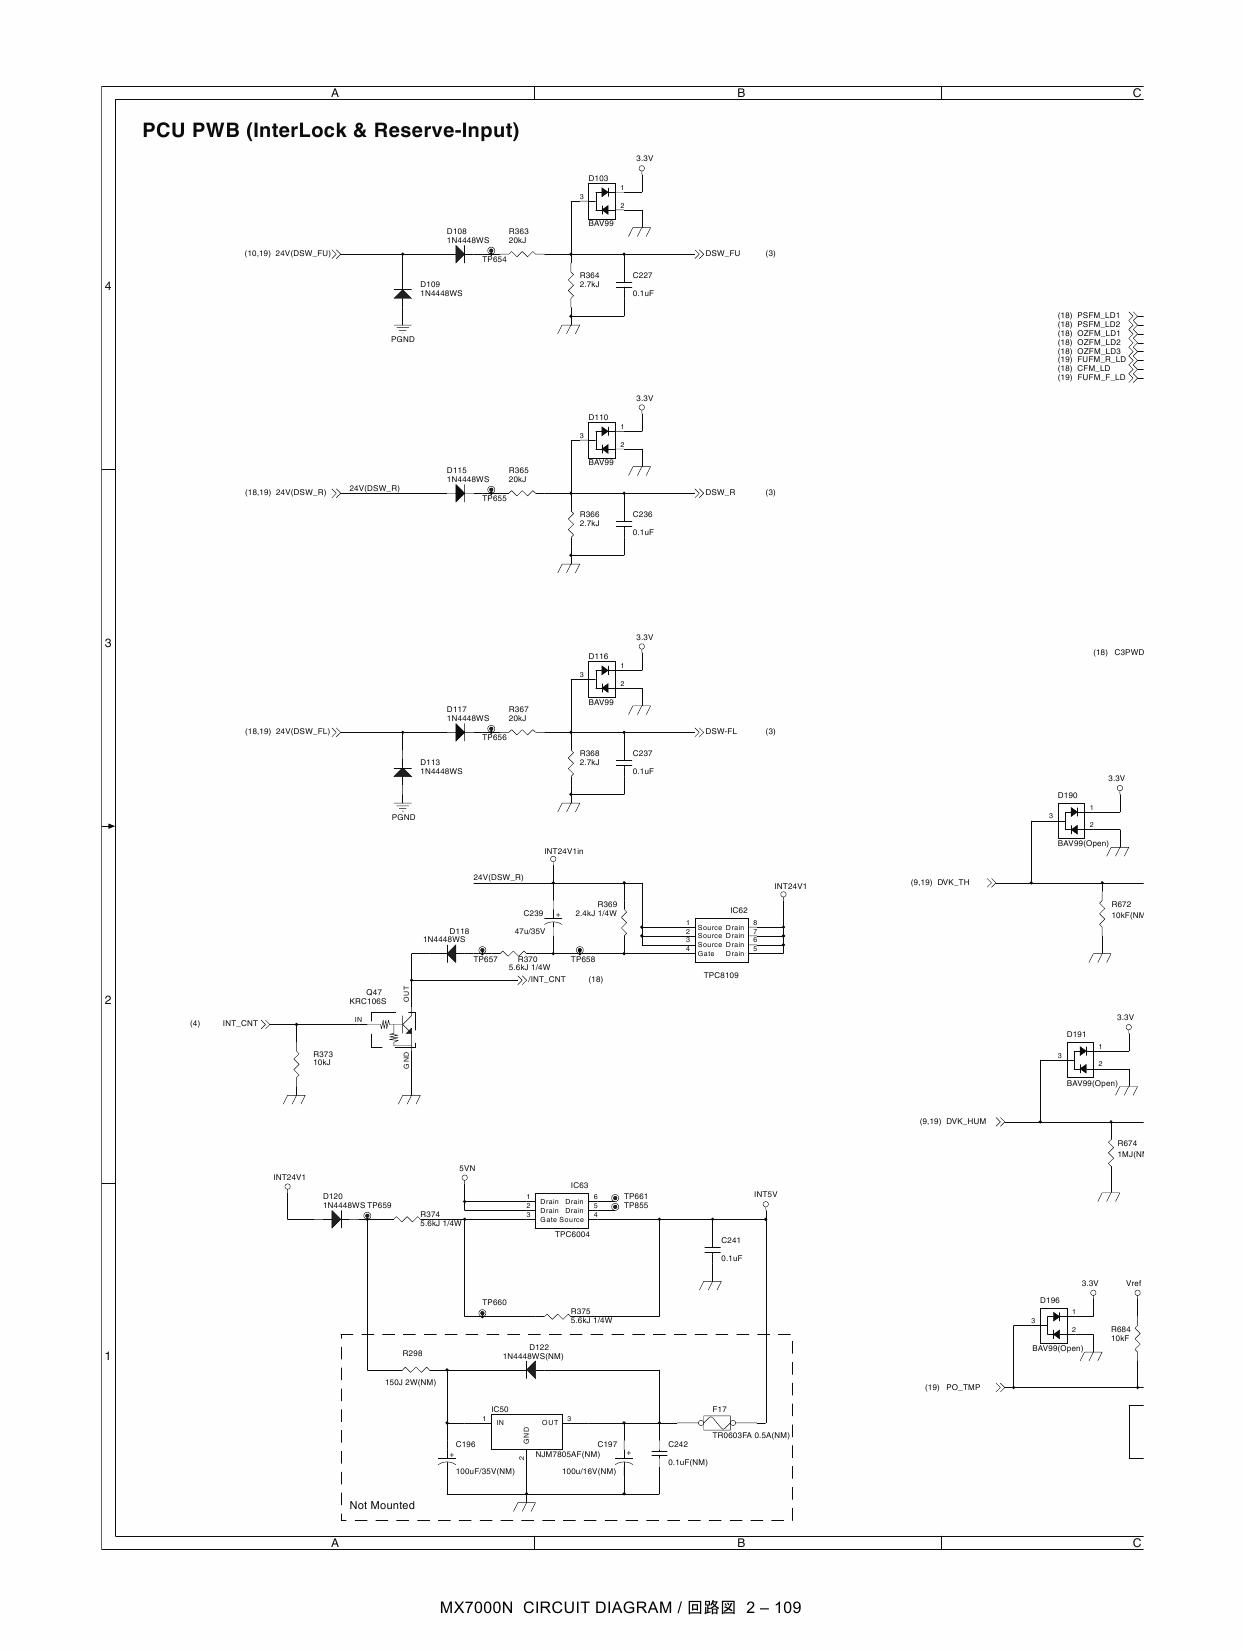 onan 5500 wiring diagram sharp mx 5500 6200 7000 n circuit diagrams